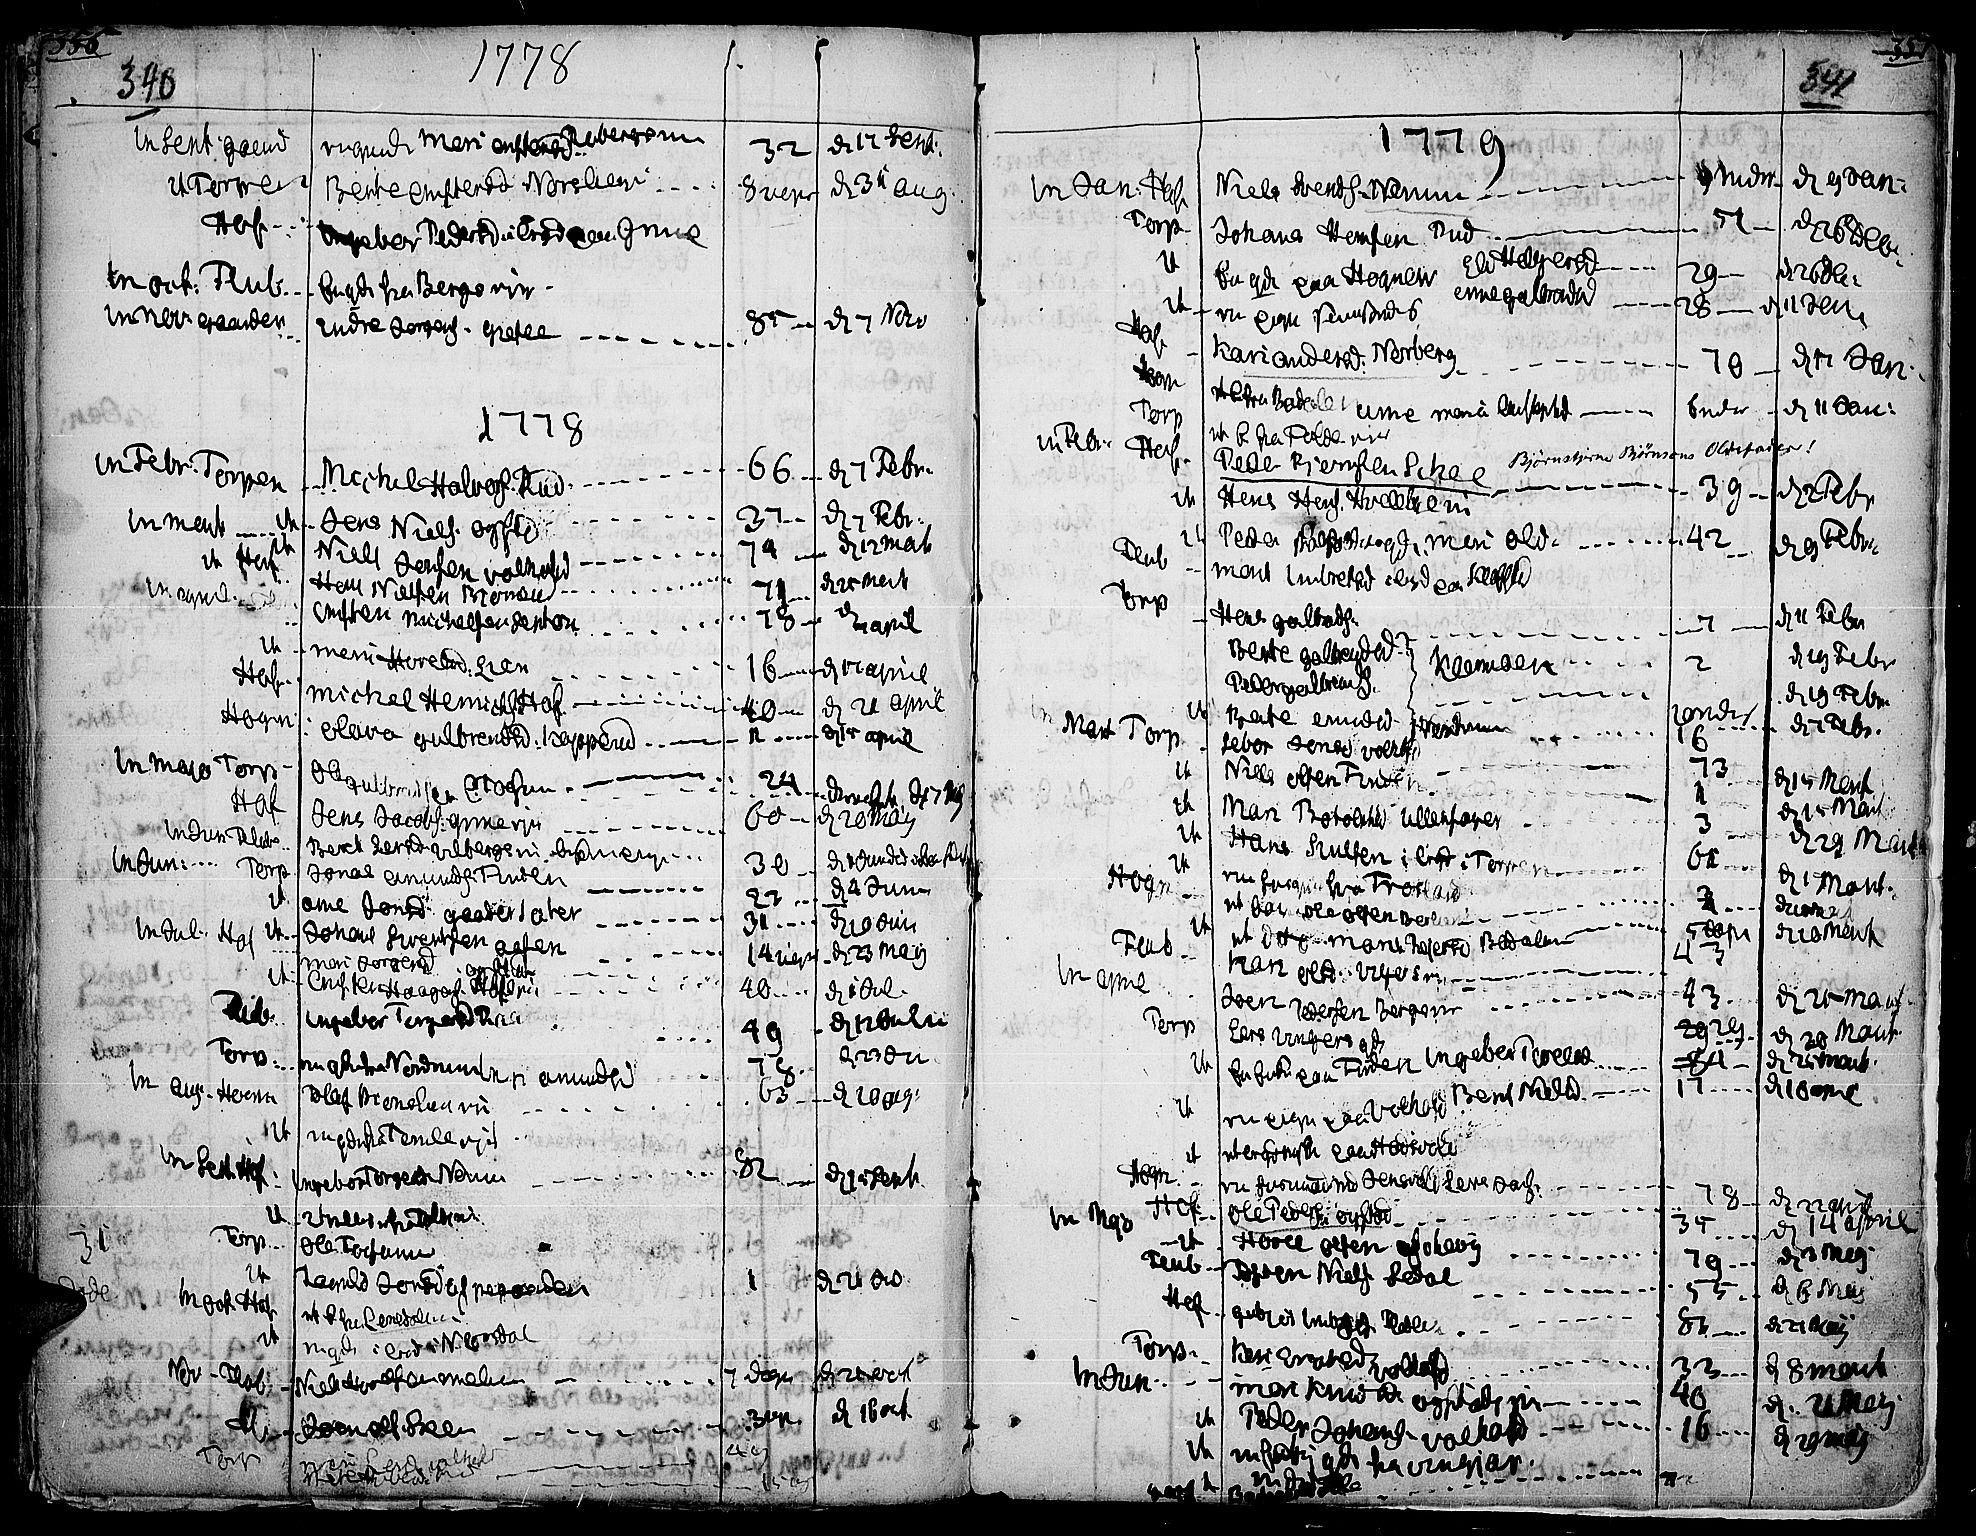 SAH, Land prestekontor, Ministerialbok nr. 5, 1765-1784, s. 340-341